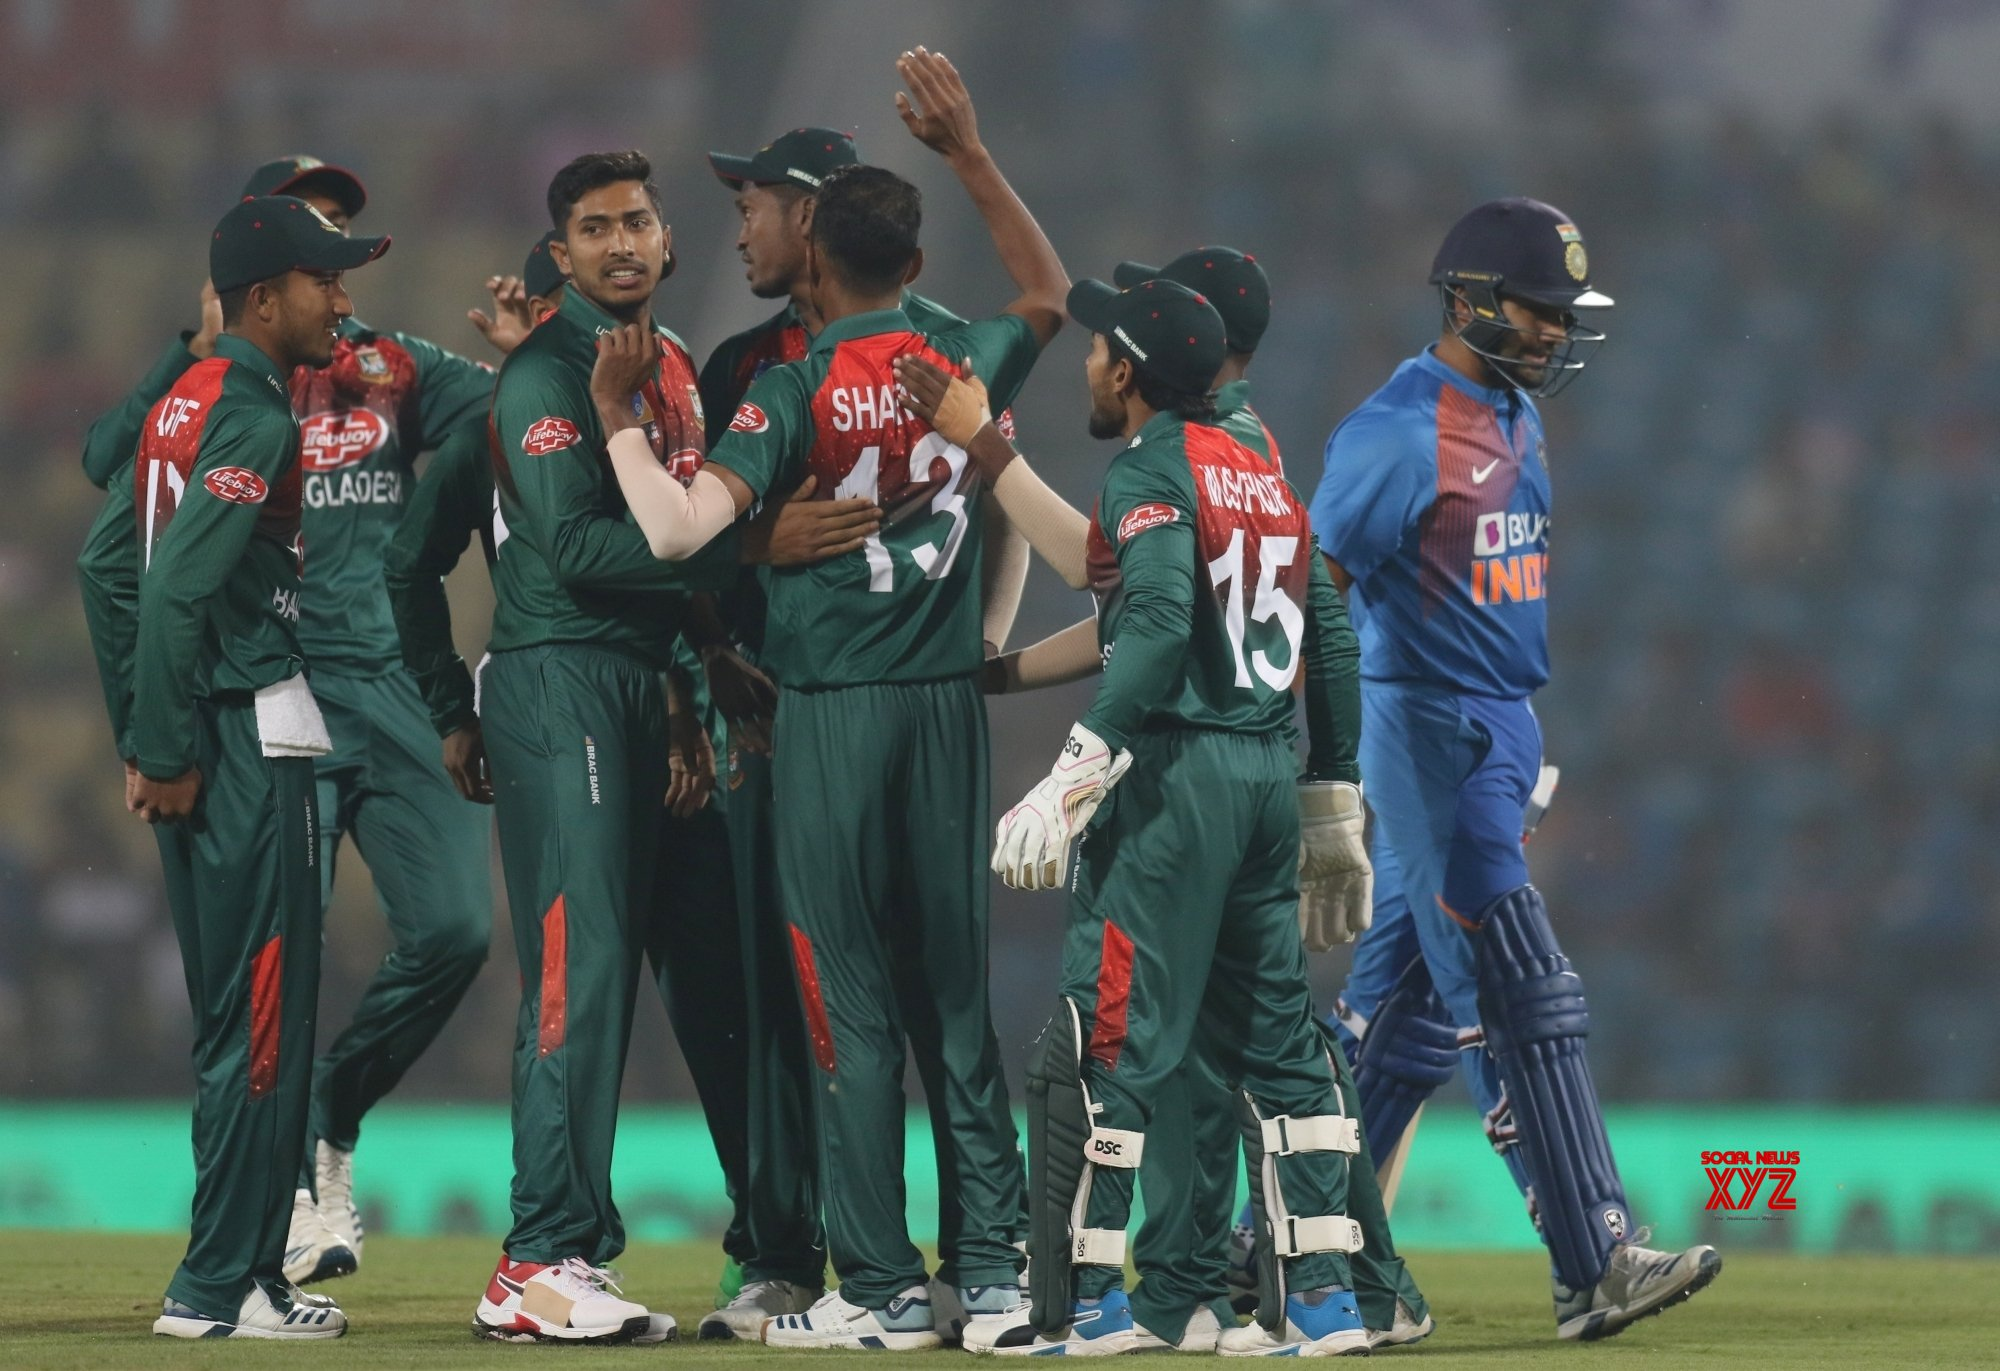 Nagpur: 3rd T20I - India Vs Bangladesh (Batch - 1) #Gallery